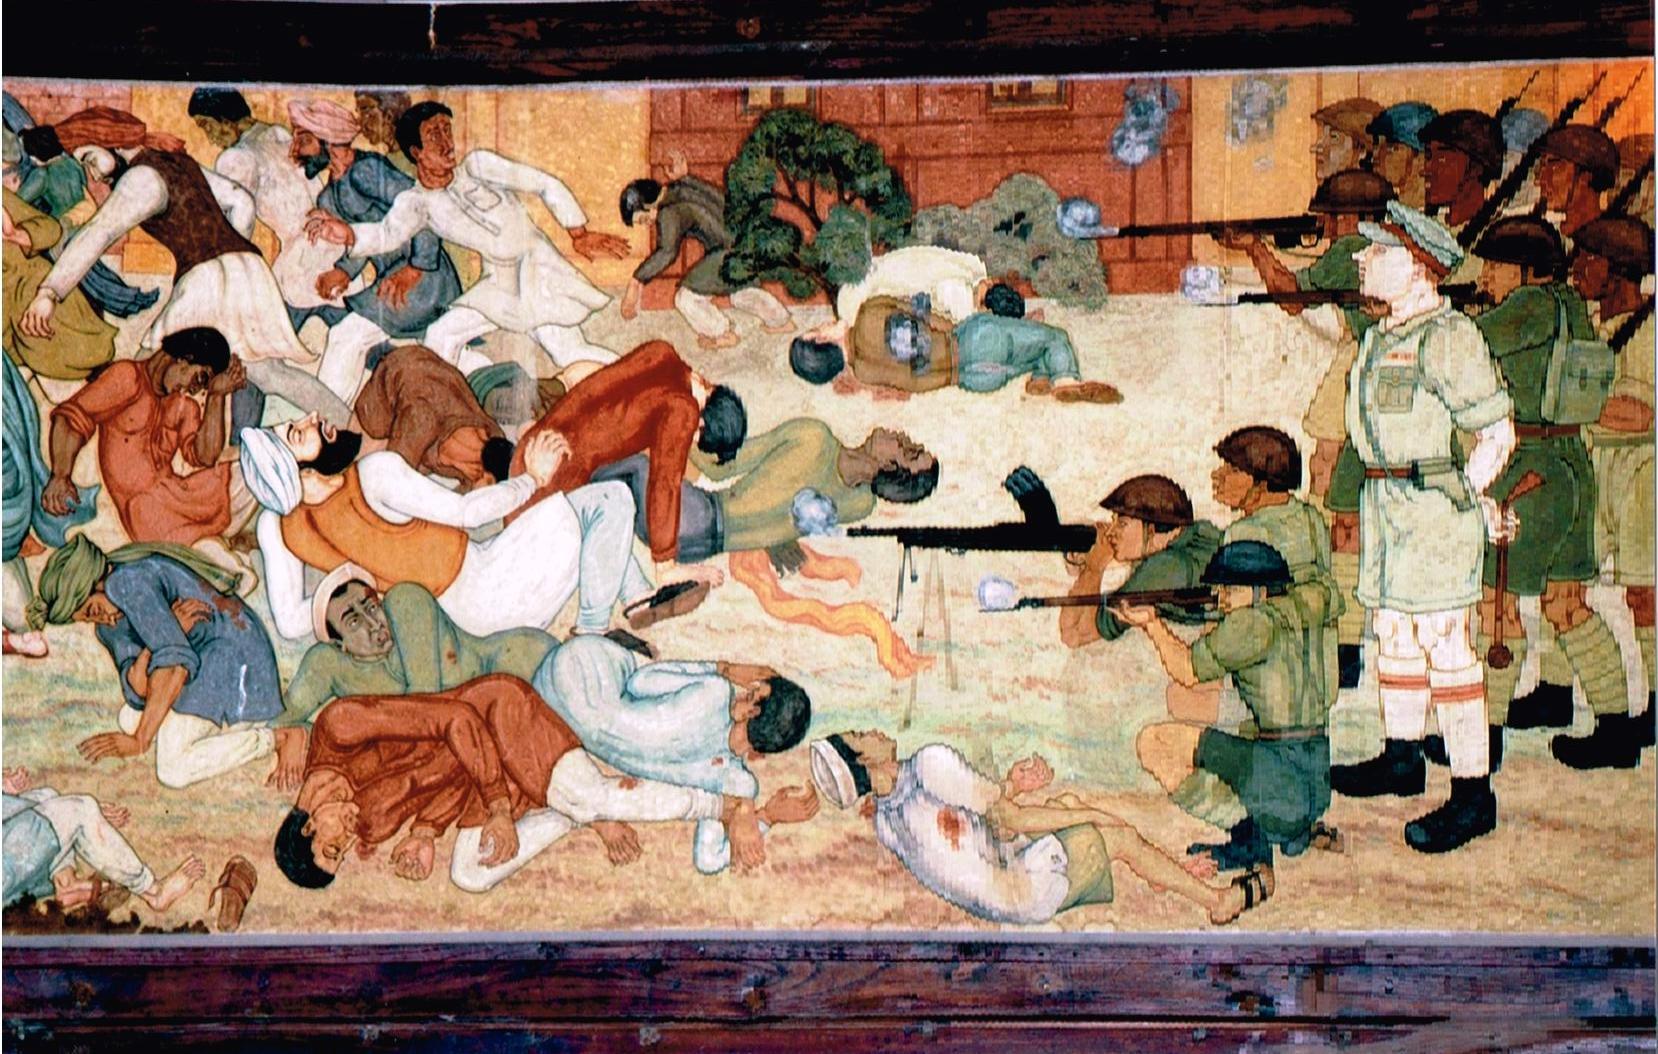 Freedom movement paintings - Jallianwala Bang - Click to Enlarge